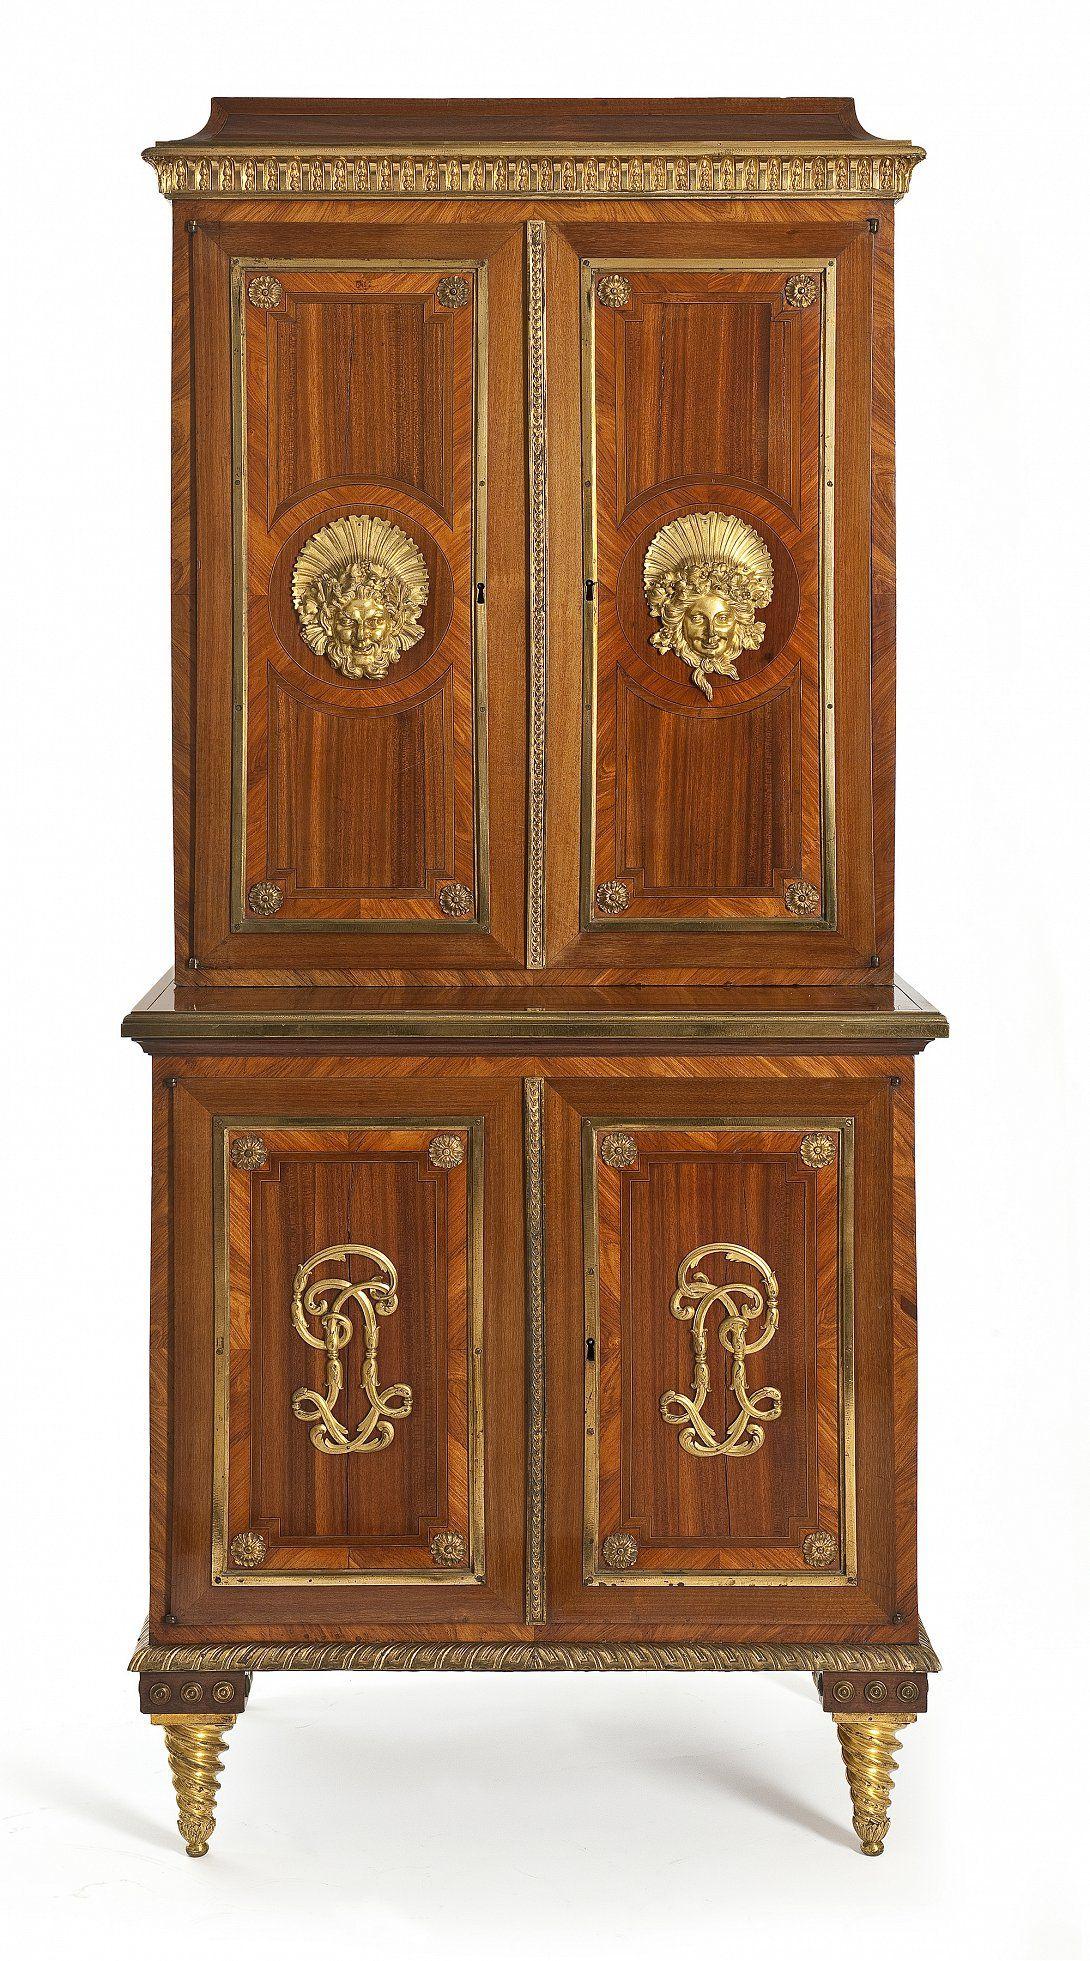 Cabinet Paris Circa 1770 1775 Pierre Garnier Cabinet Frame Oak Veneer Satin Ebony Rosewood And Ama Neoclassical Furniture Antique Armoire Gilded Furniture